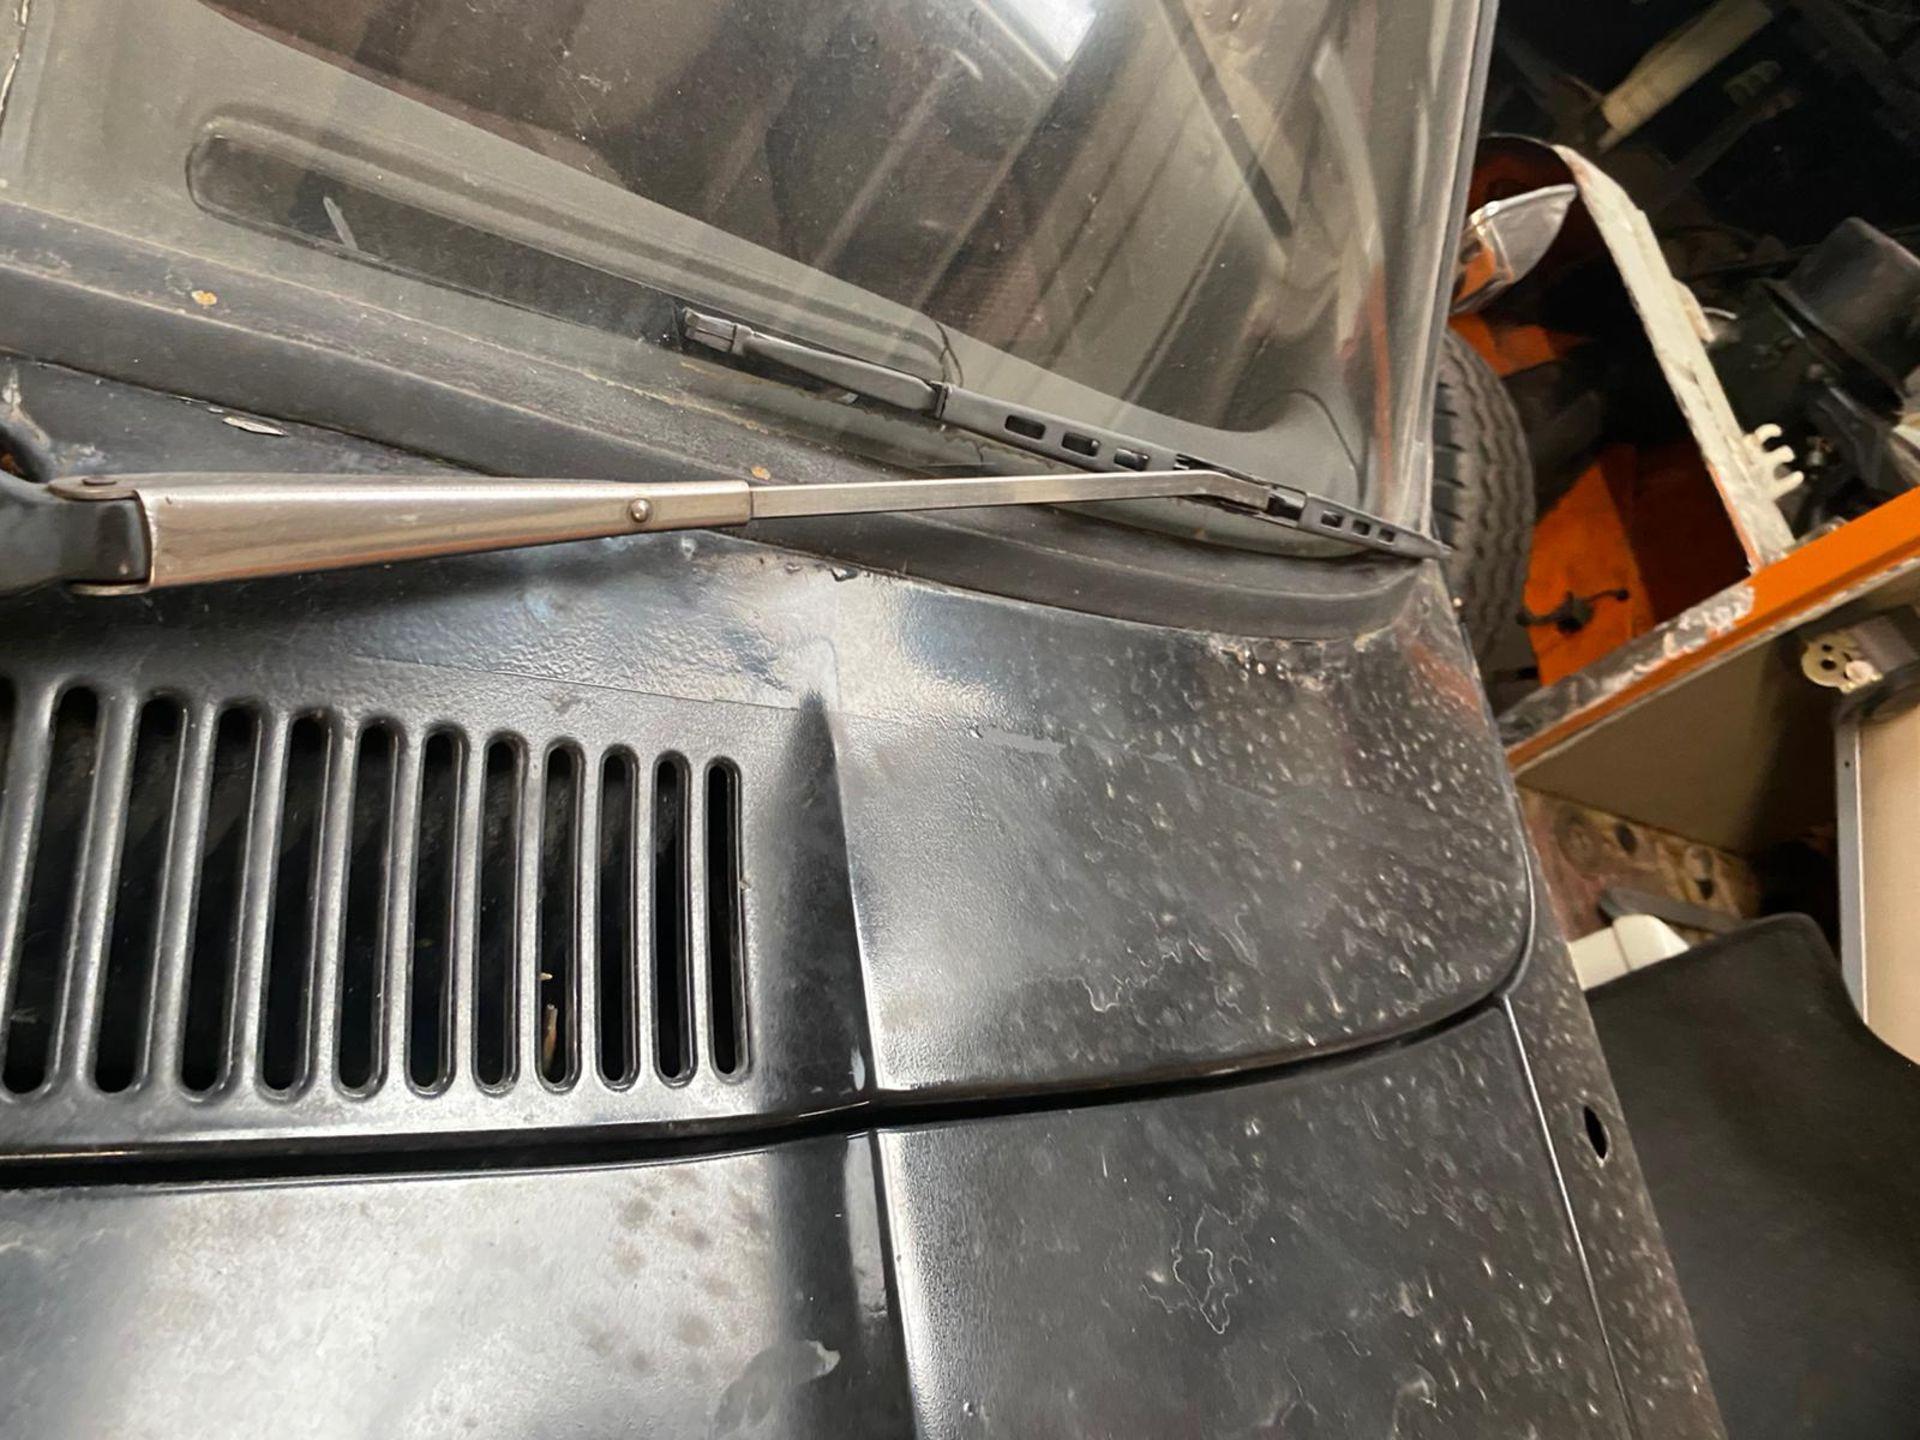 1986/C REG FORD CAPRI LASER AUTO 2.0 PETROL BLACK 3 DOOR *NO VAT* - Image 28 of 32